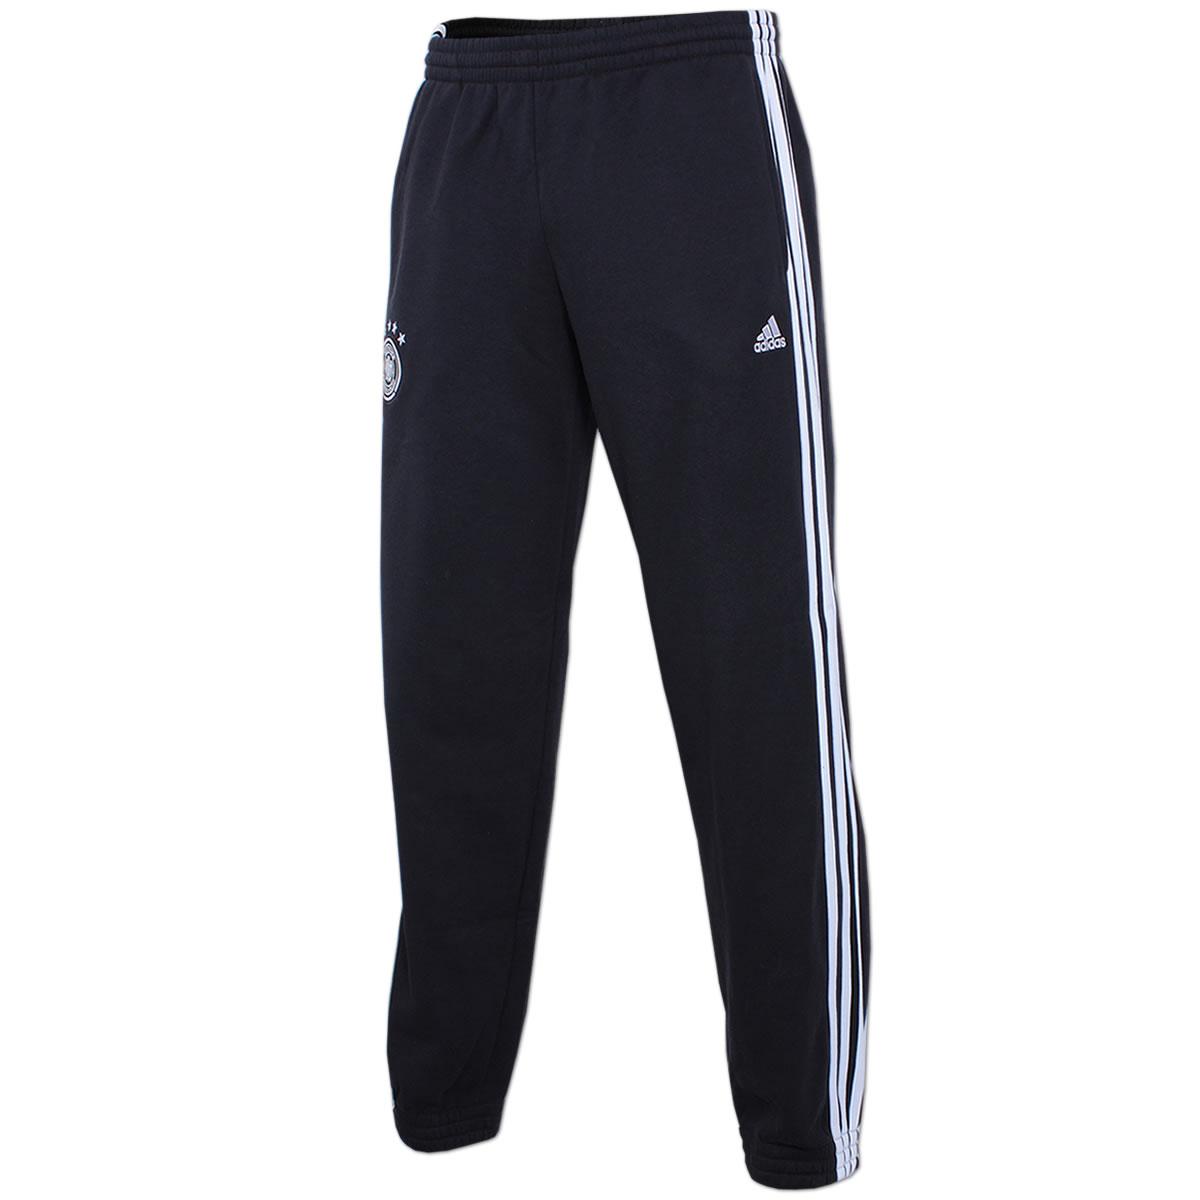 e9d11fb0414c8e adidas Herren DFB Pant Trainingshose Fußballhose Sweat Pant Sporthose 4  Sterne